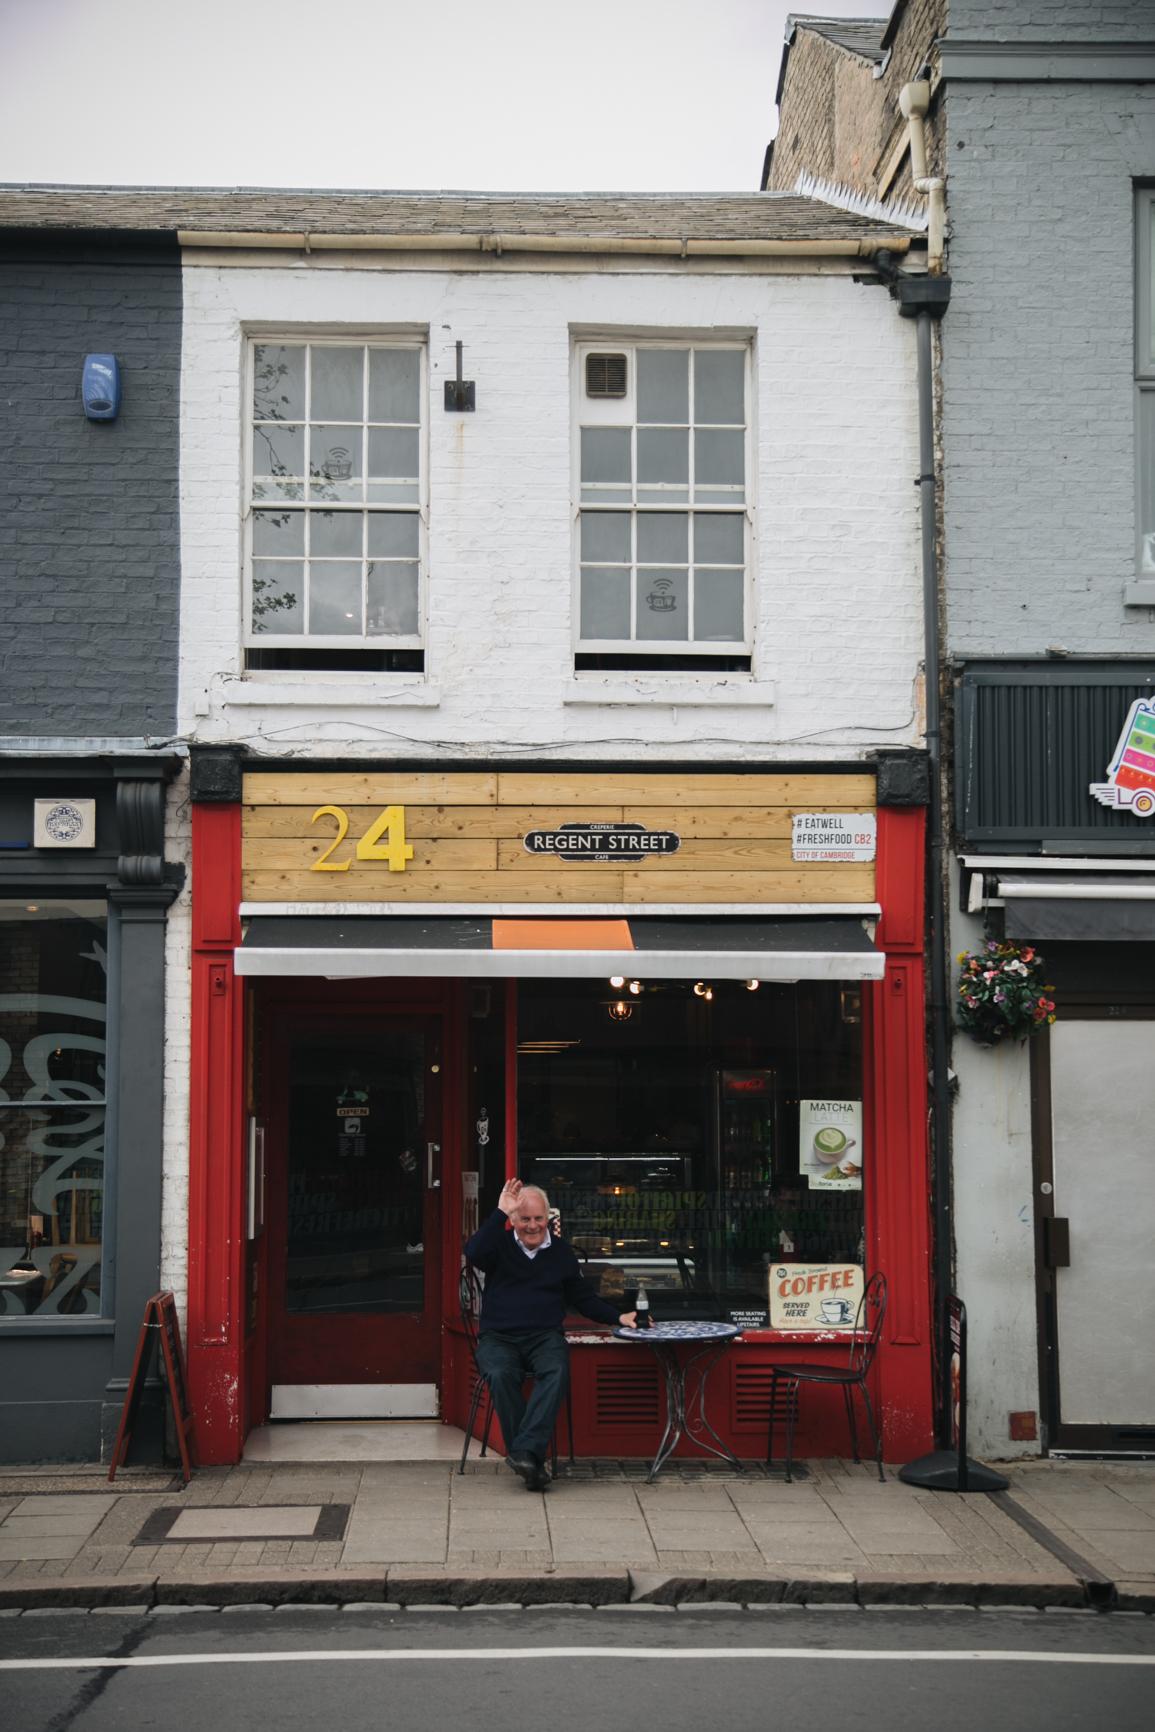 cambridge-bars-coffees-pubs-adresses.jpg